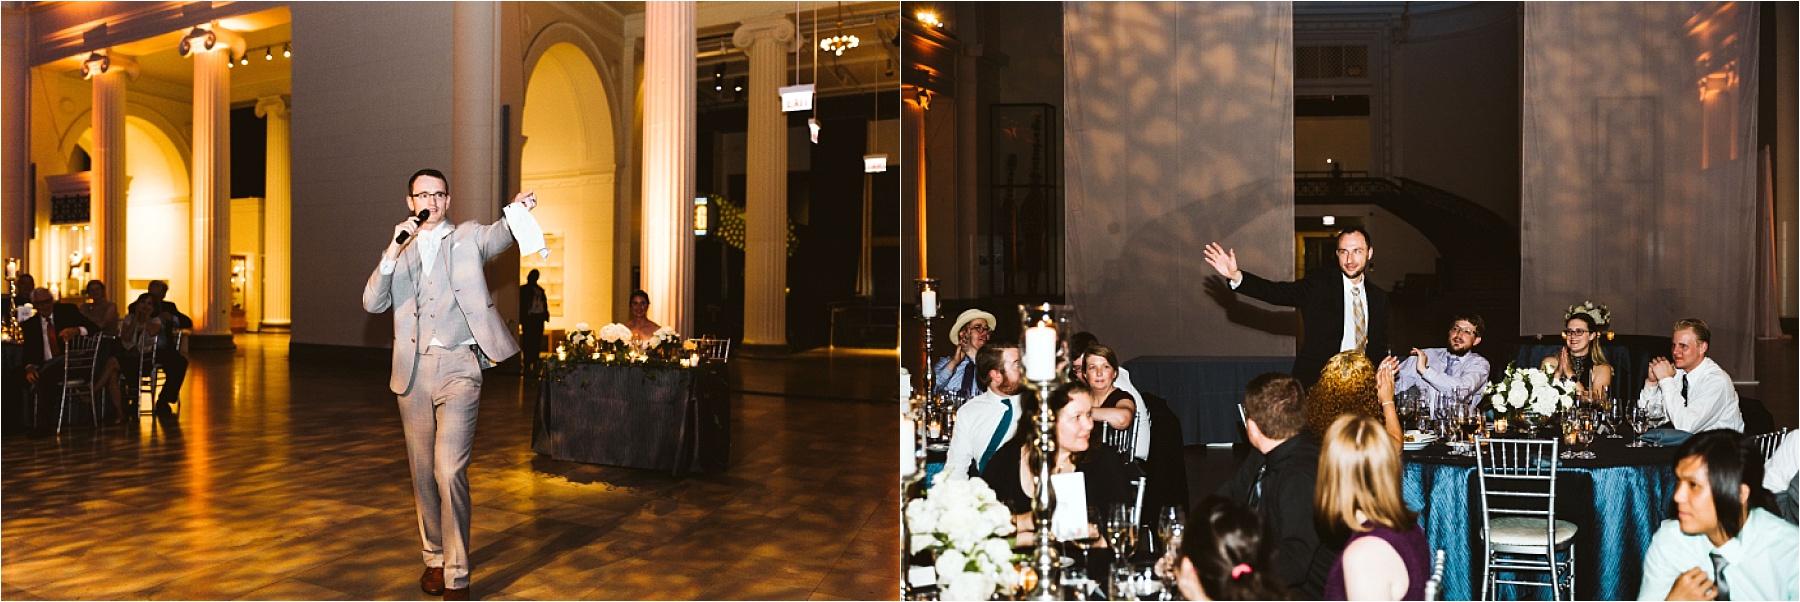 Chicago Field Museum Wedding_0124.jpg